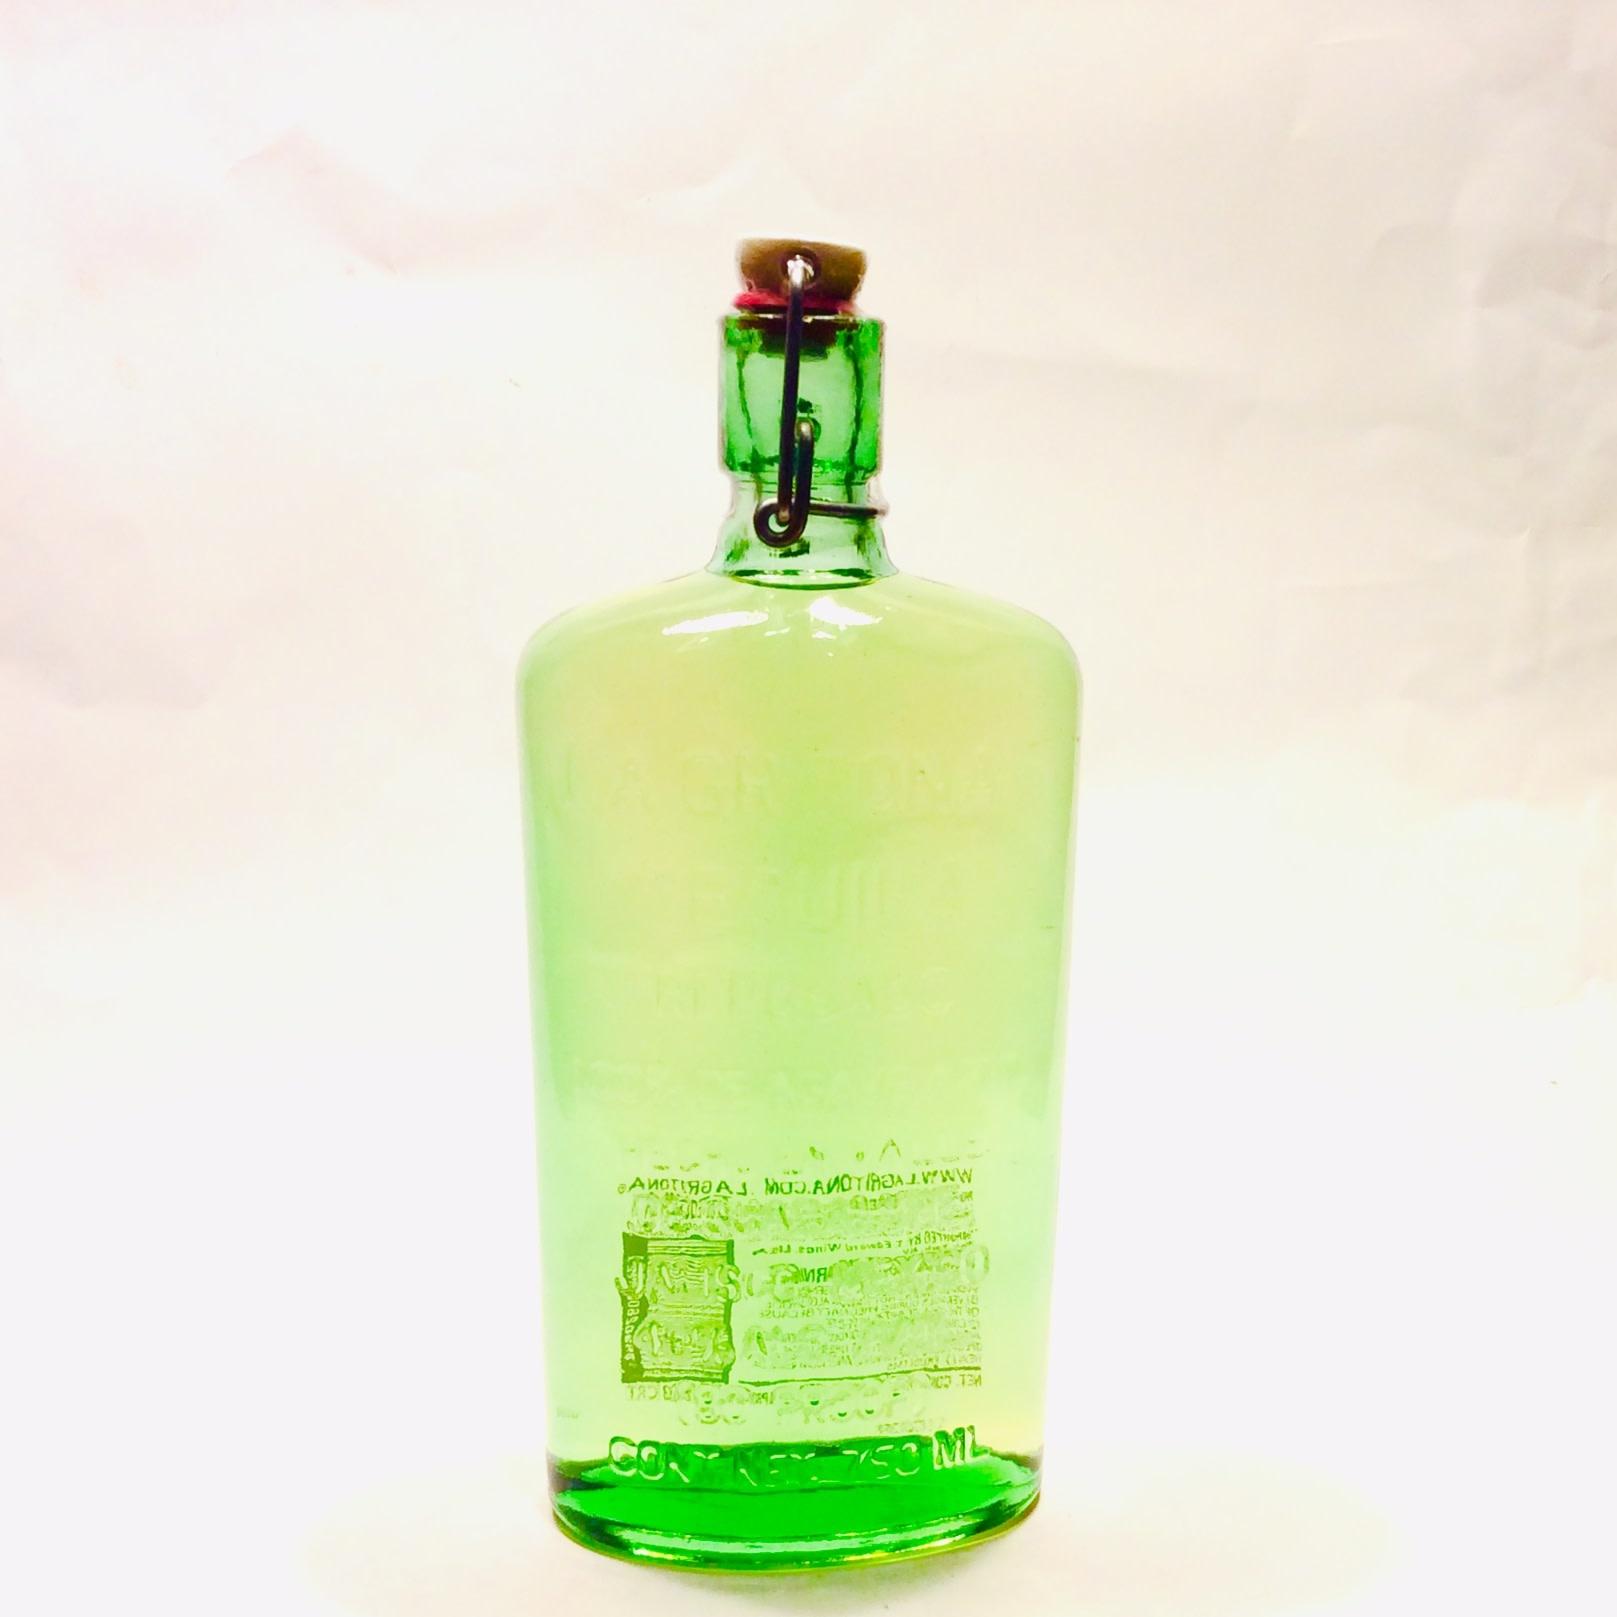 La Gritona 100% de Agave Tequila Reposado (750 ml)